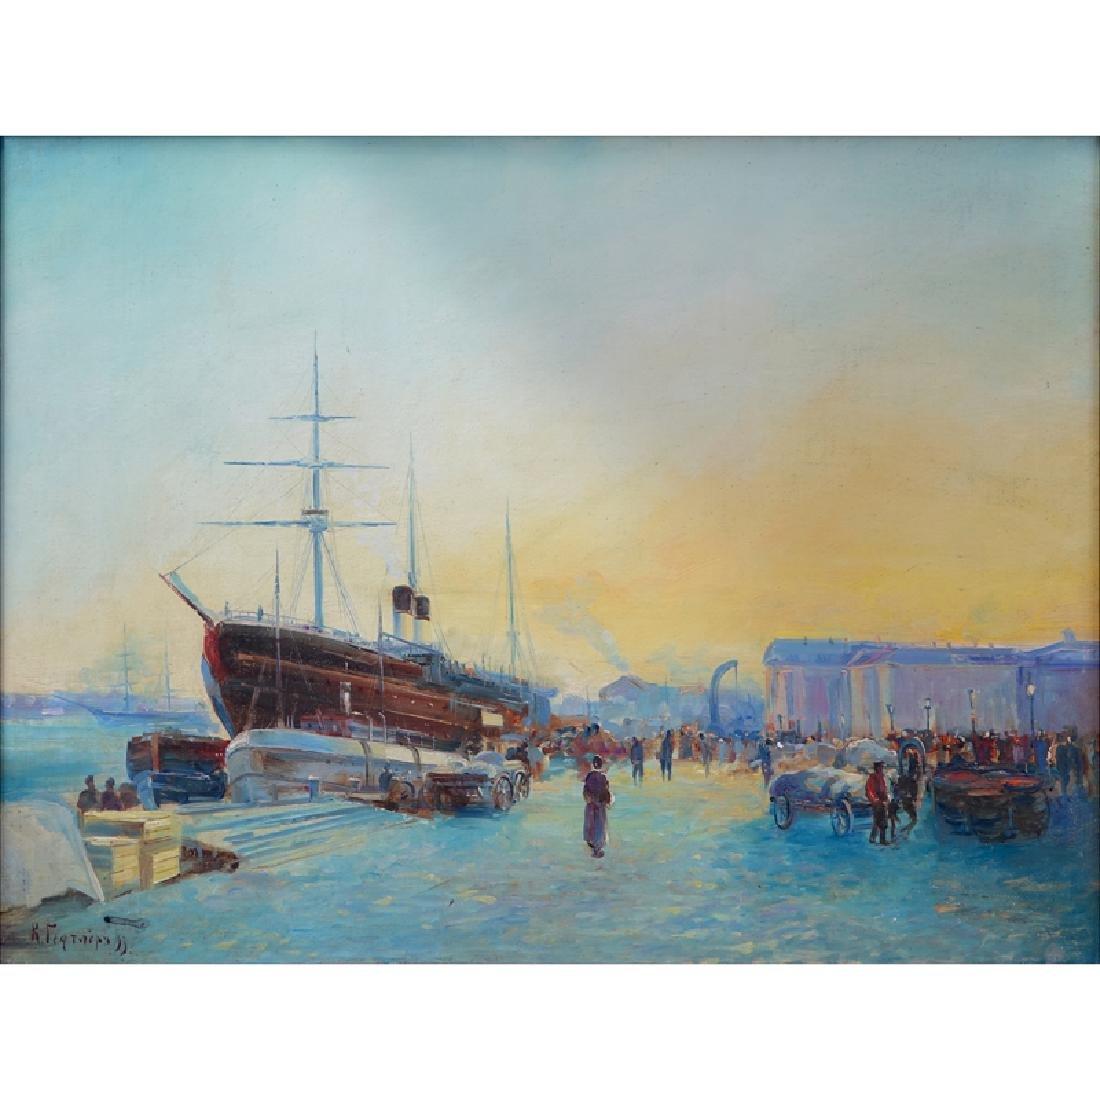 Karl Eduardovich Geftler, Russian (1858-1918) Oil on